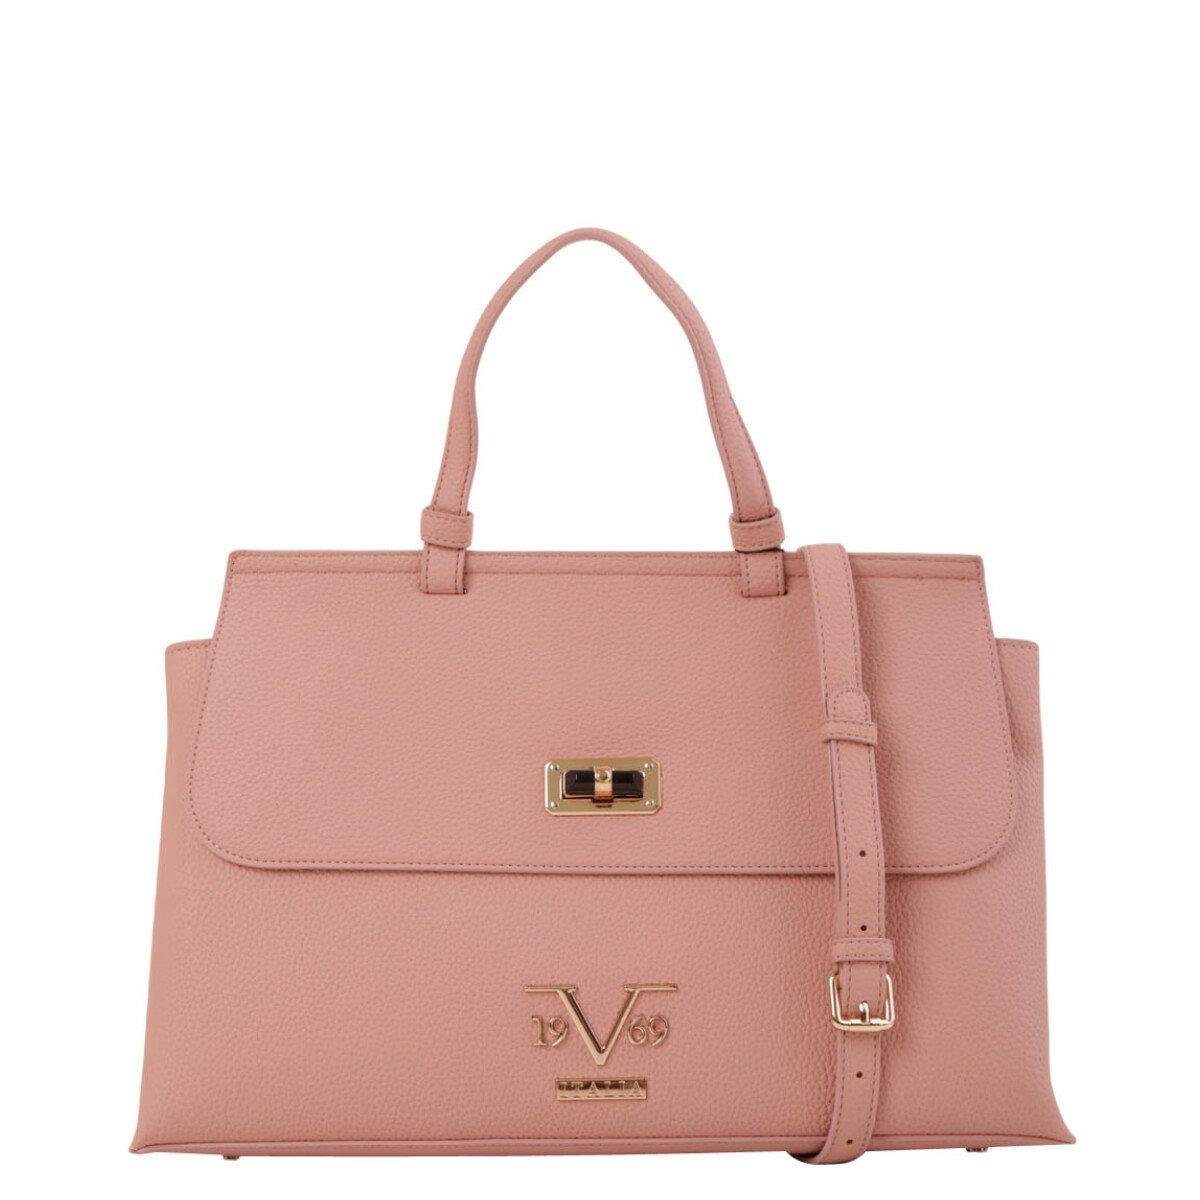 19v69 Italia Women's Handbag Various Colours 318989 - pink UNICA